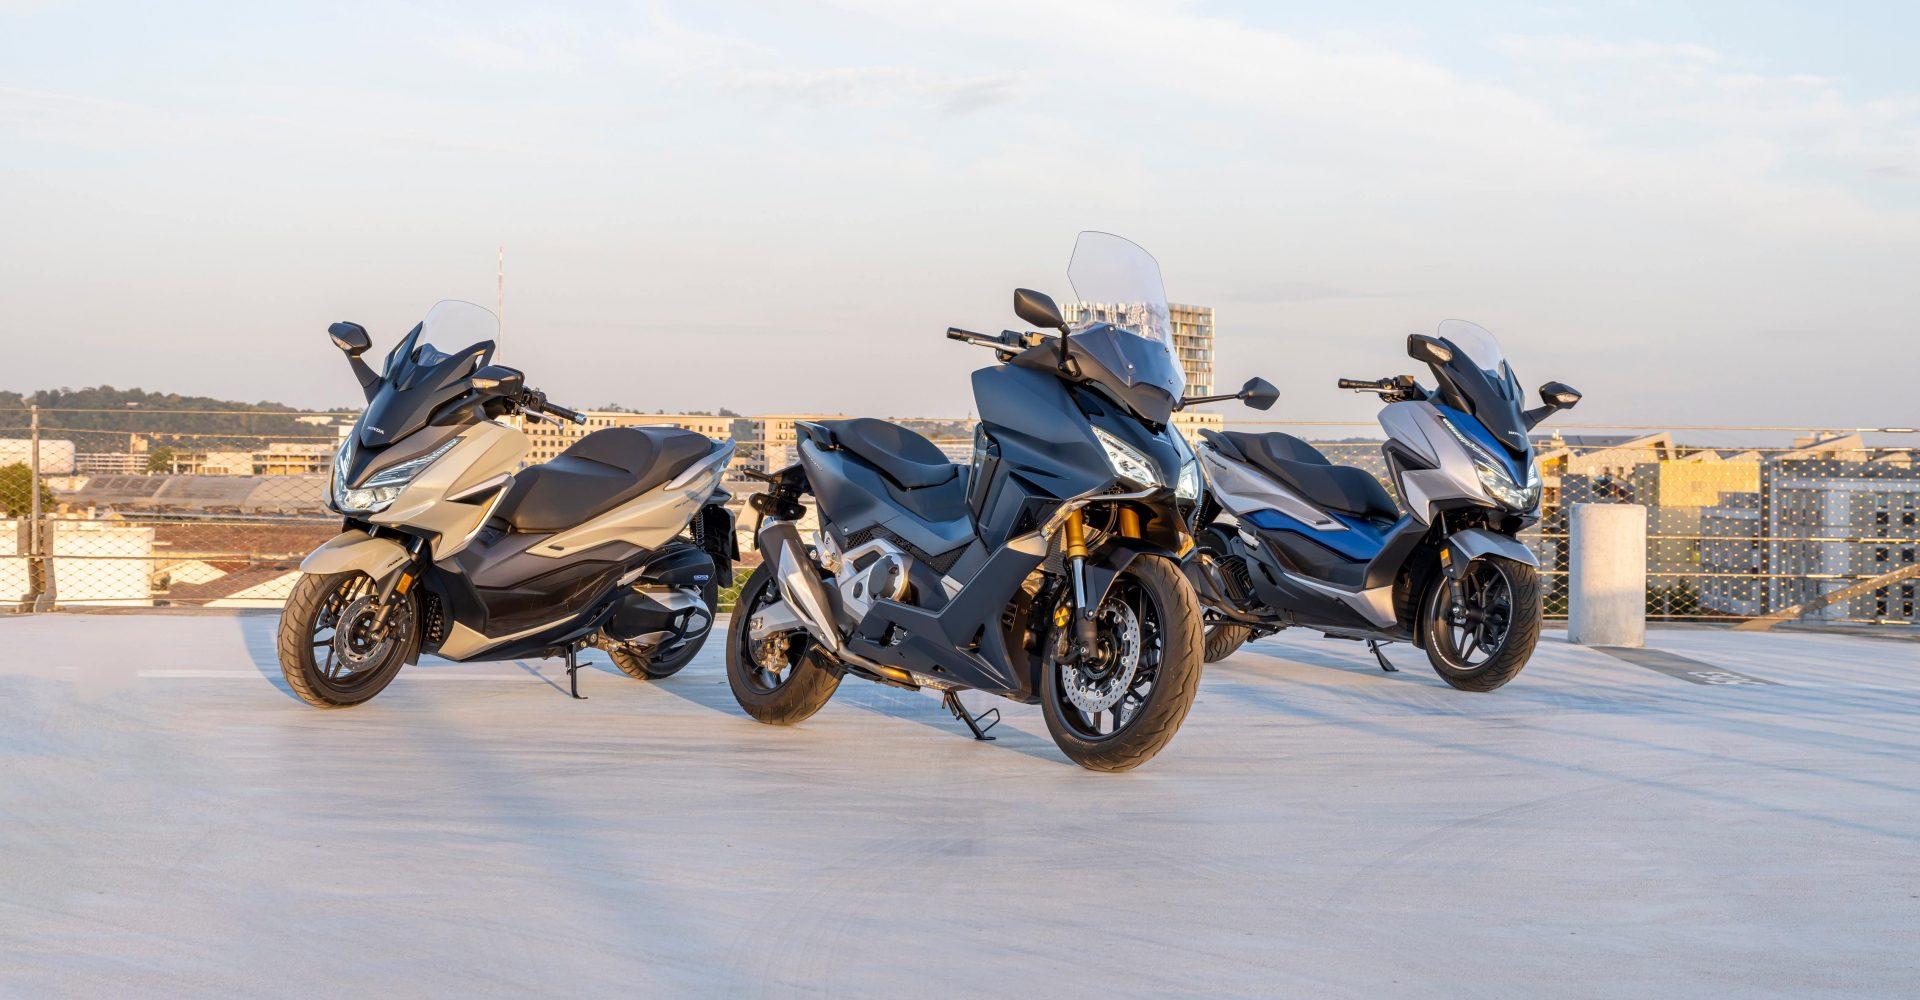 Honda enhances scooter range with new Forza models